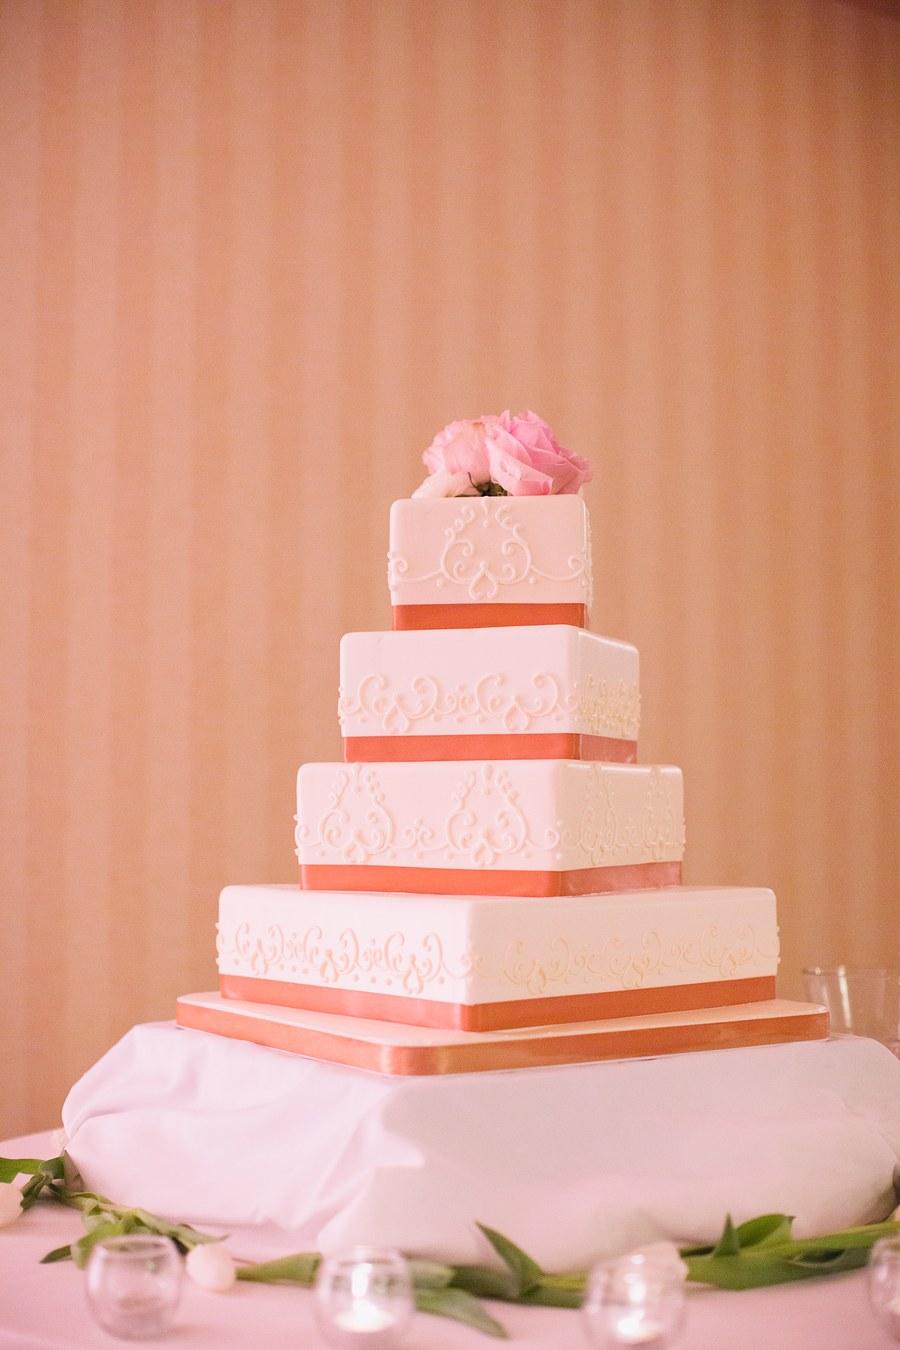 White Wedding Cake with Gold - Elizabeth Anne Designs: The Wedding Blog